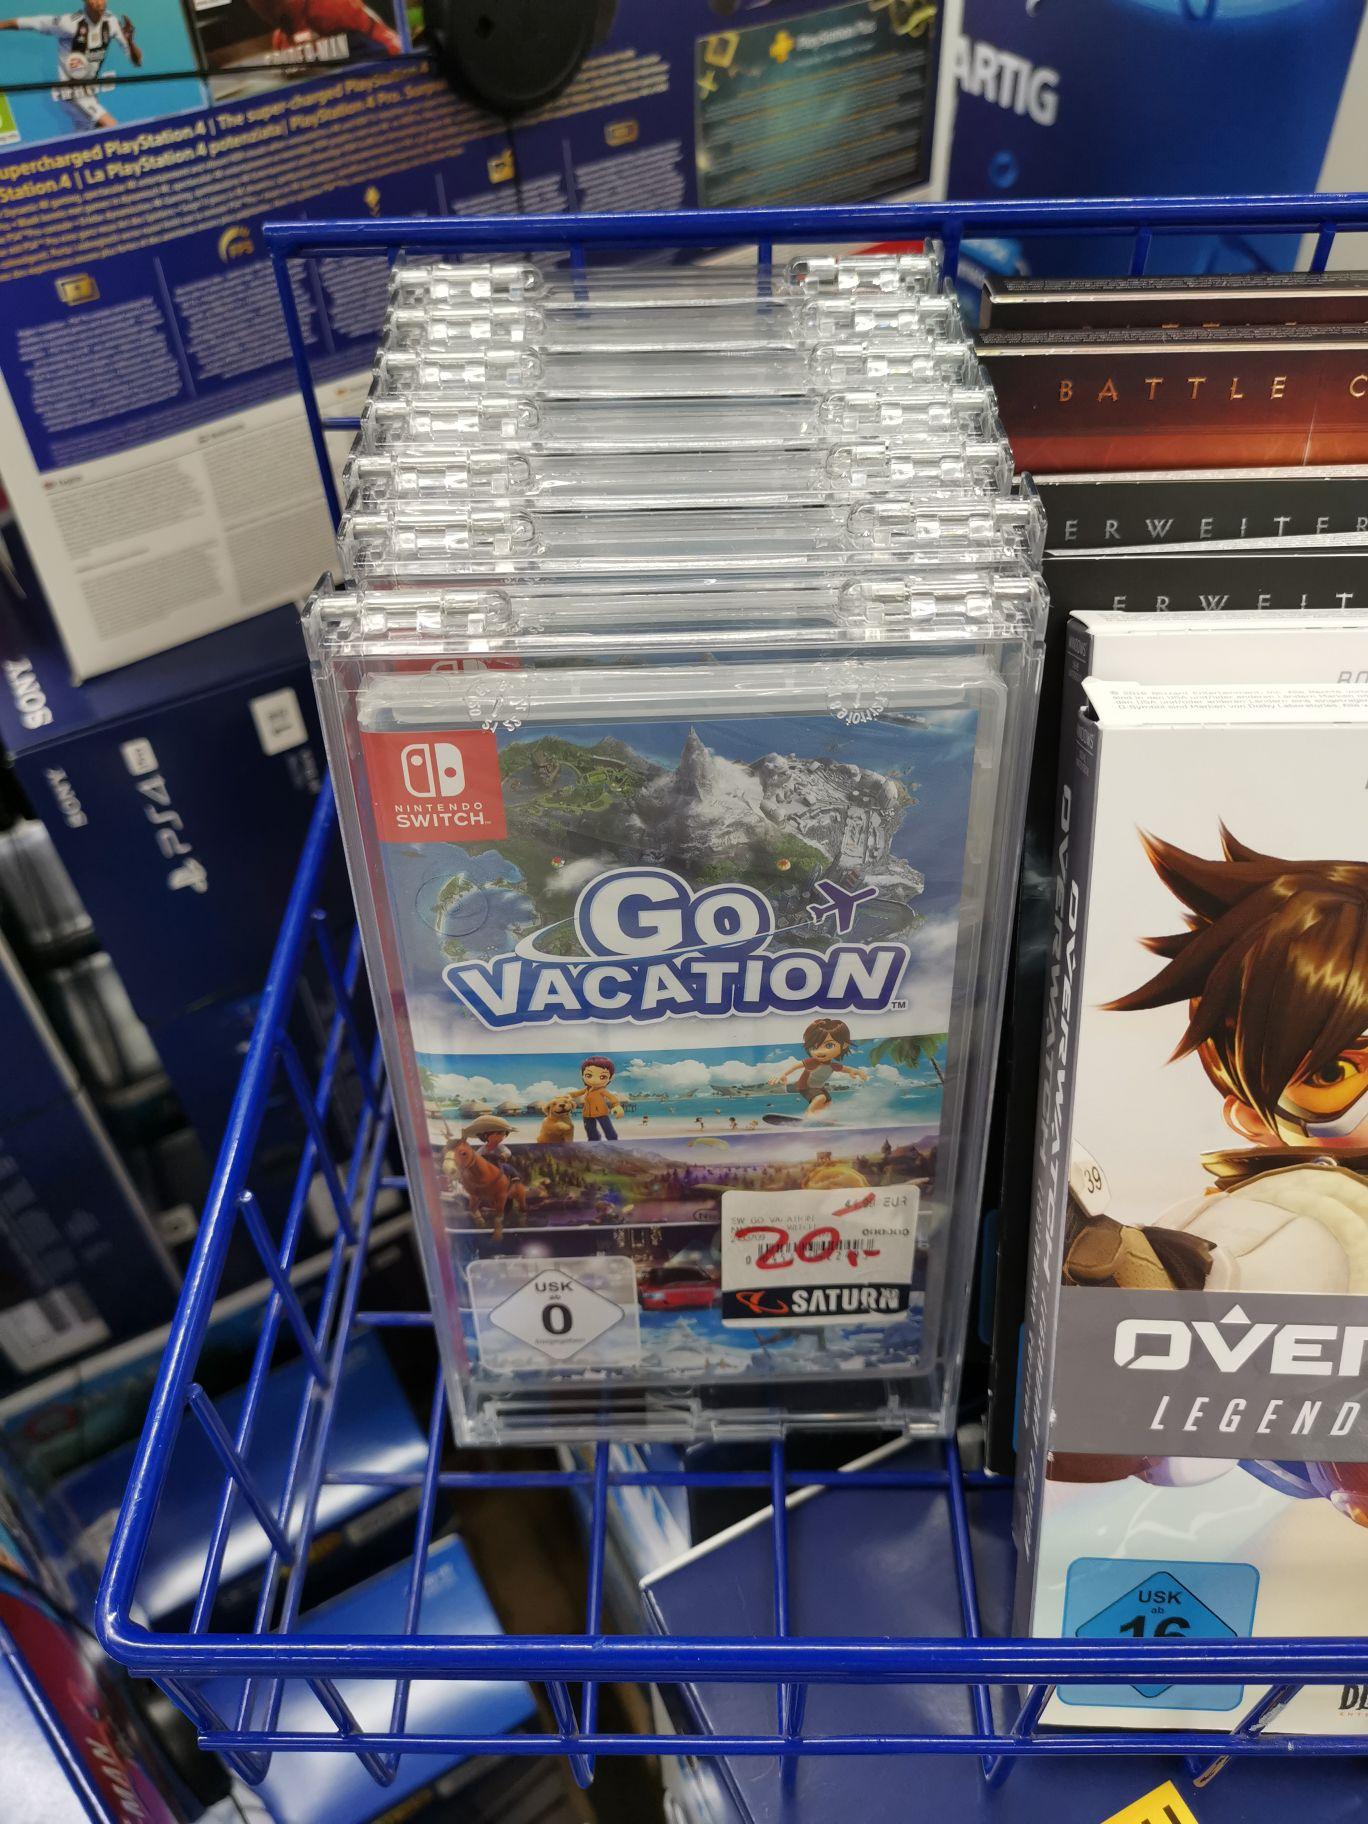 Go Vacation Nintendo Switch - Saturn Berlin Gesundbrunnen [Lokal]